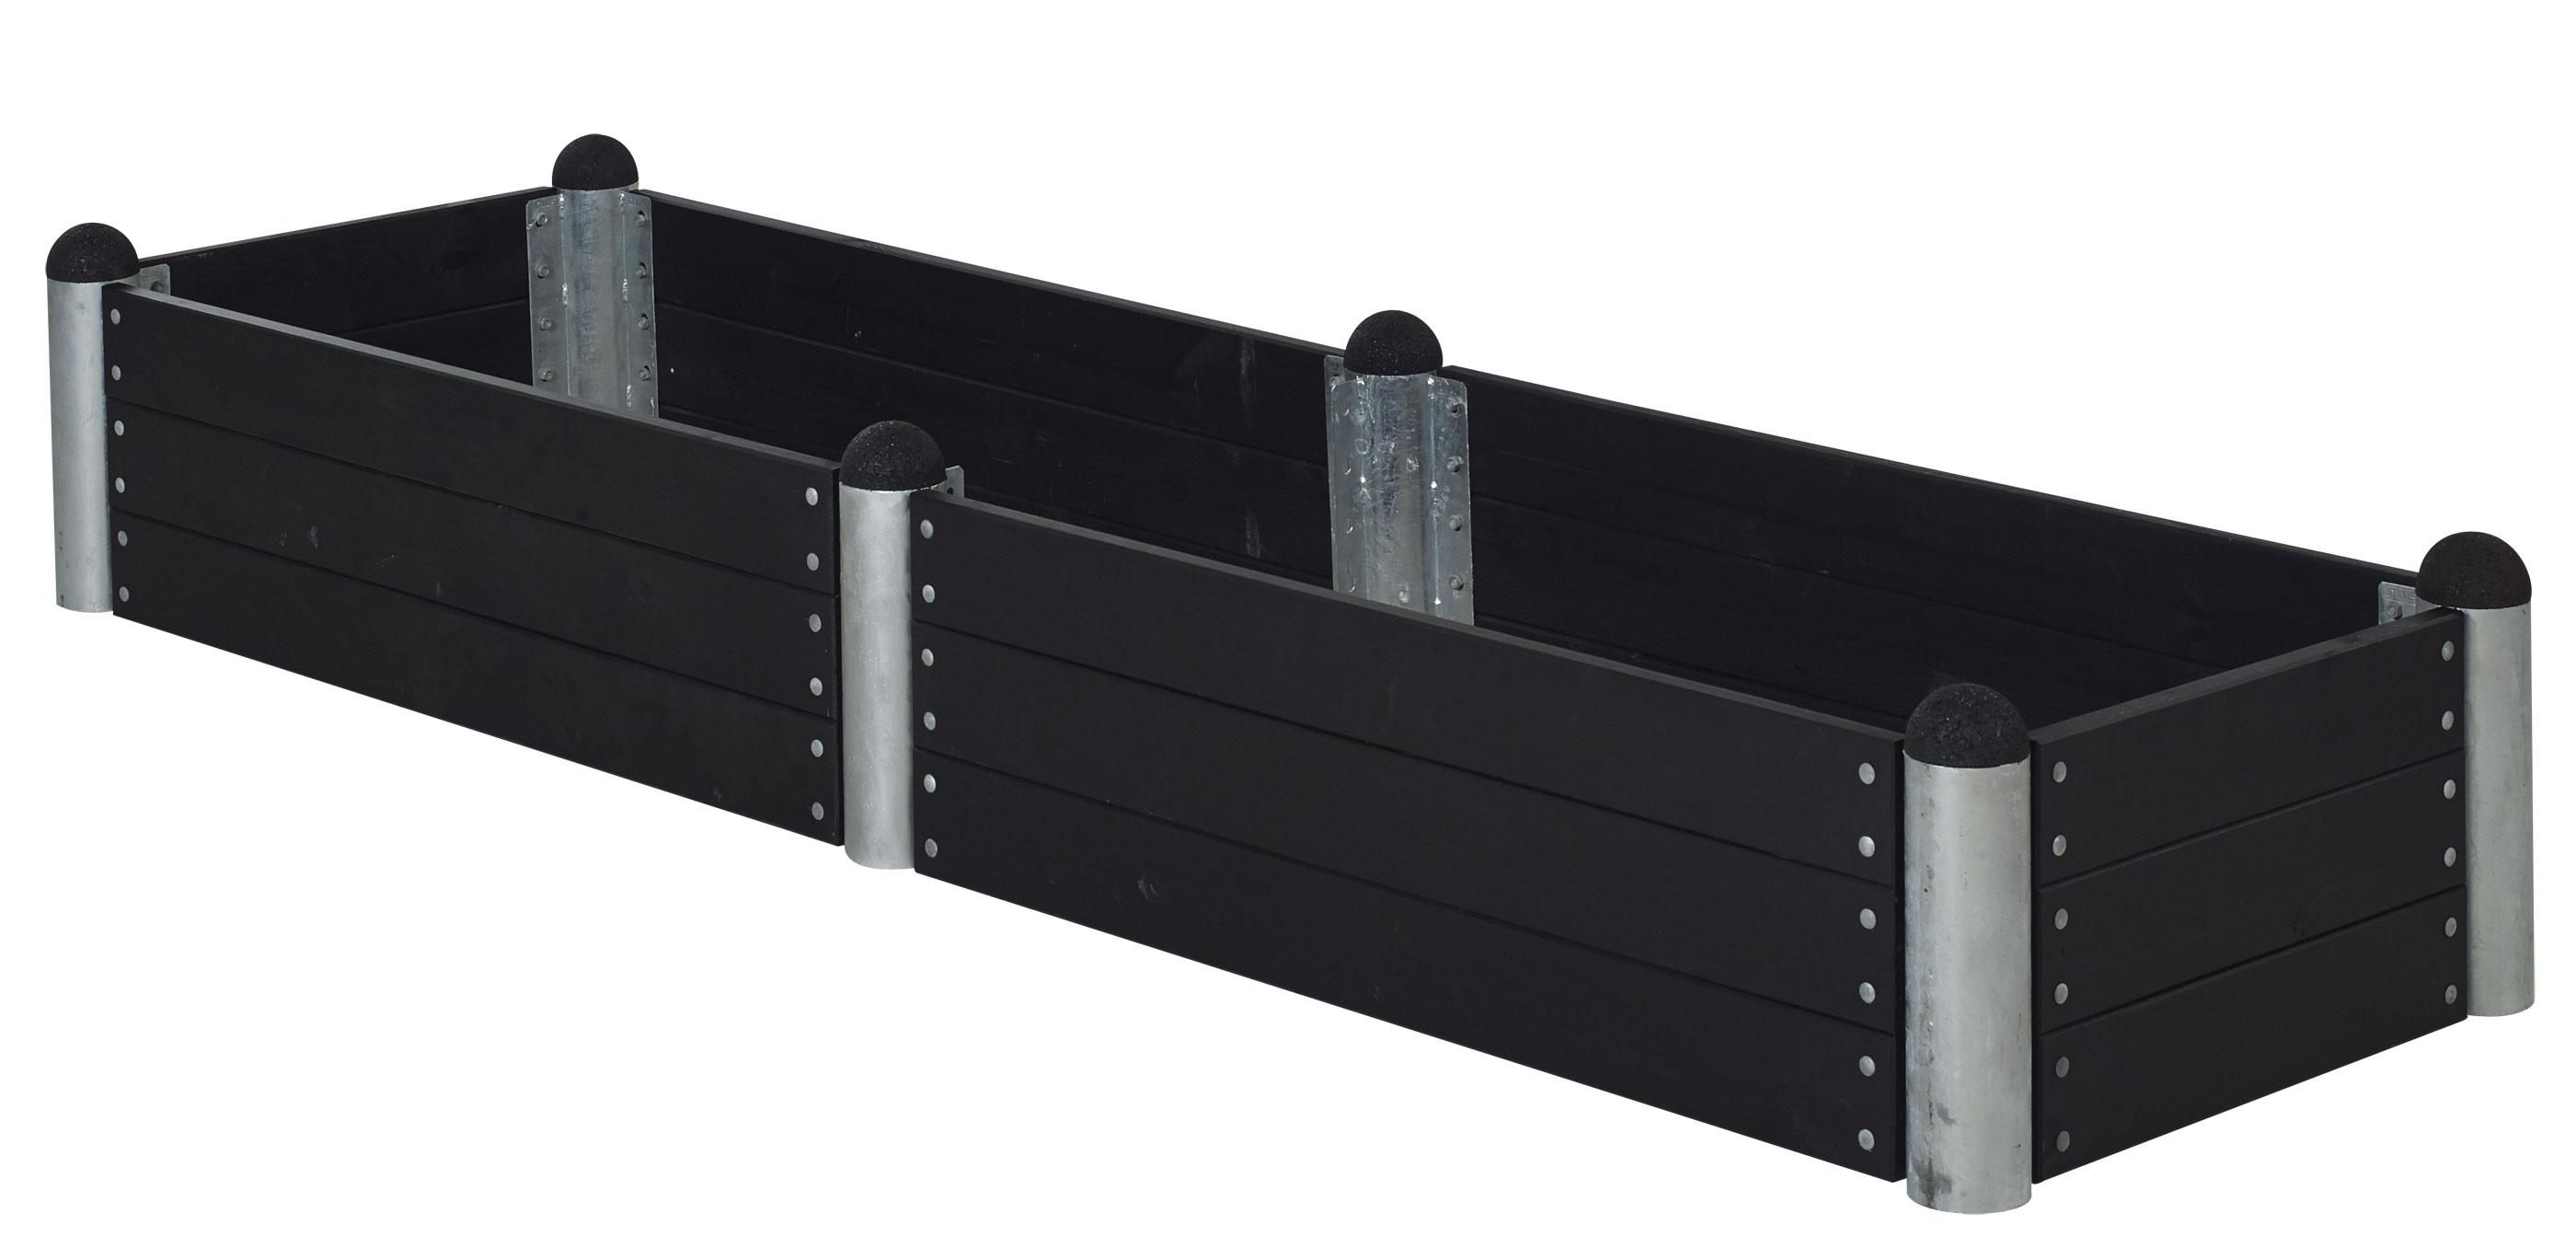 Hochbeet PIPE10a Modulsystem Plus 270x80x36cm kdi schwarz Bild 1